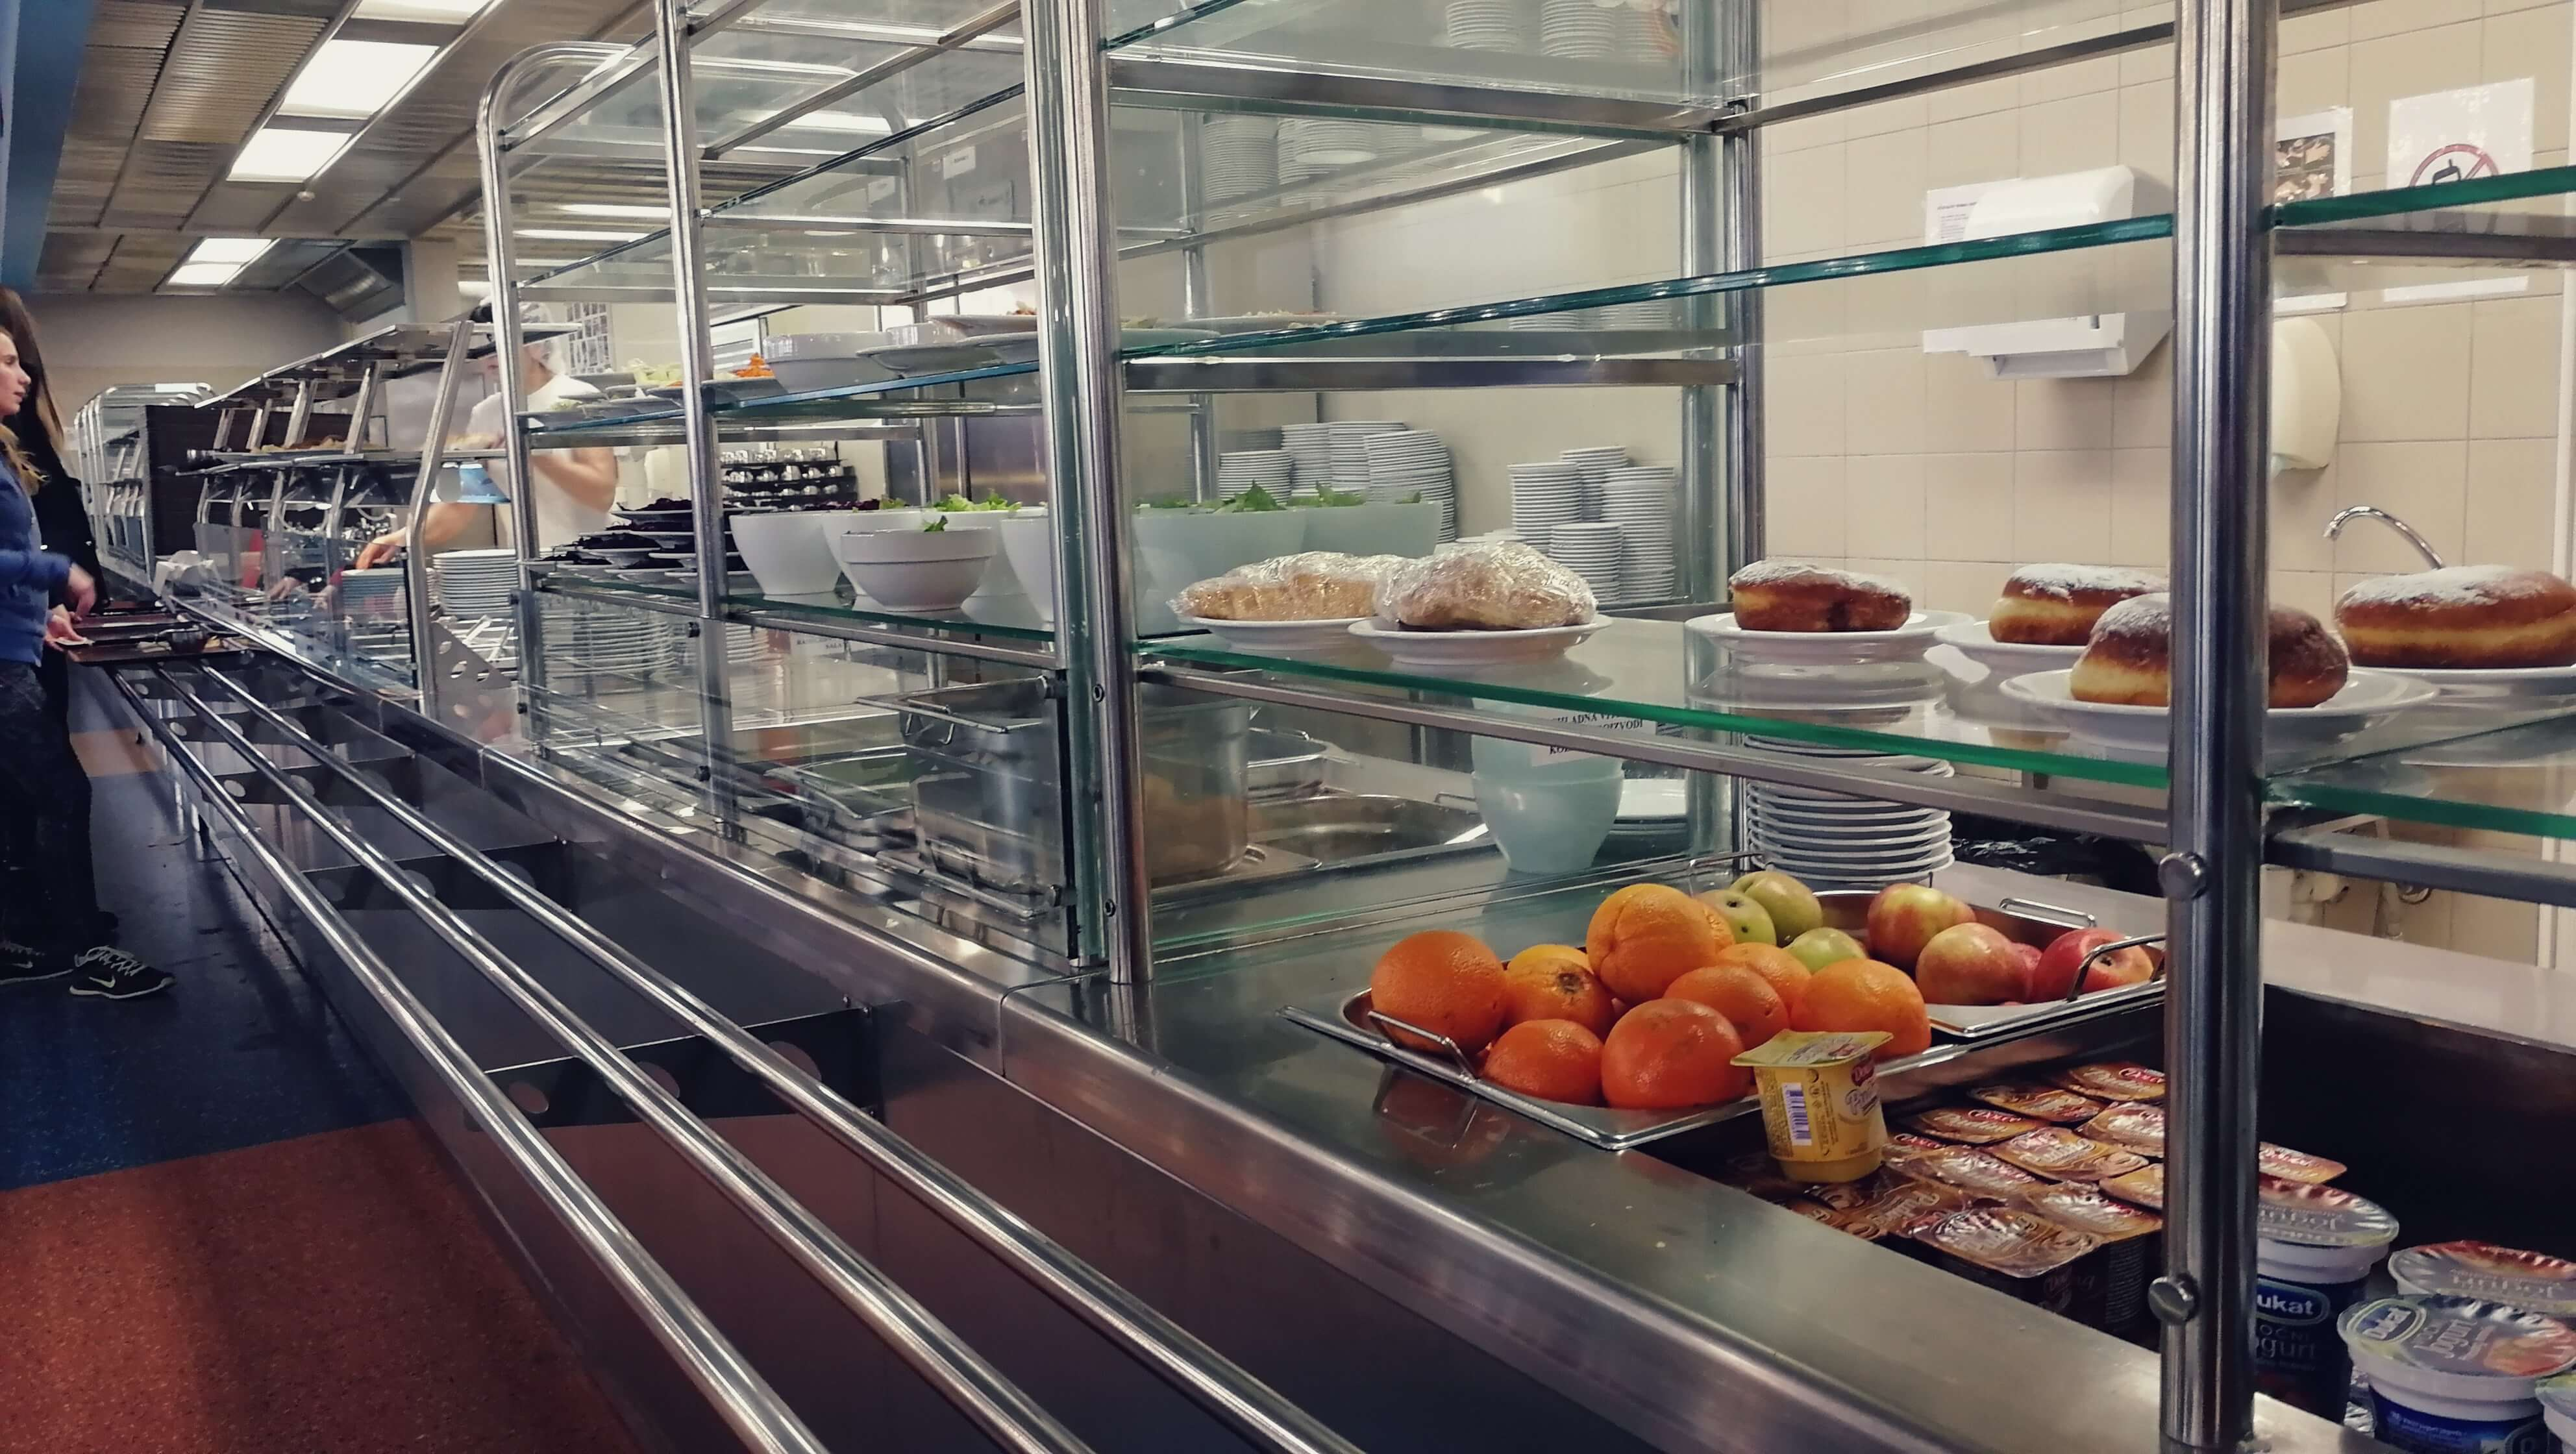 Bye, bye ljetnoj fit formi: Studentski centar uveo nove 'spacijalitete' u menzu